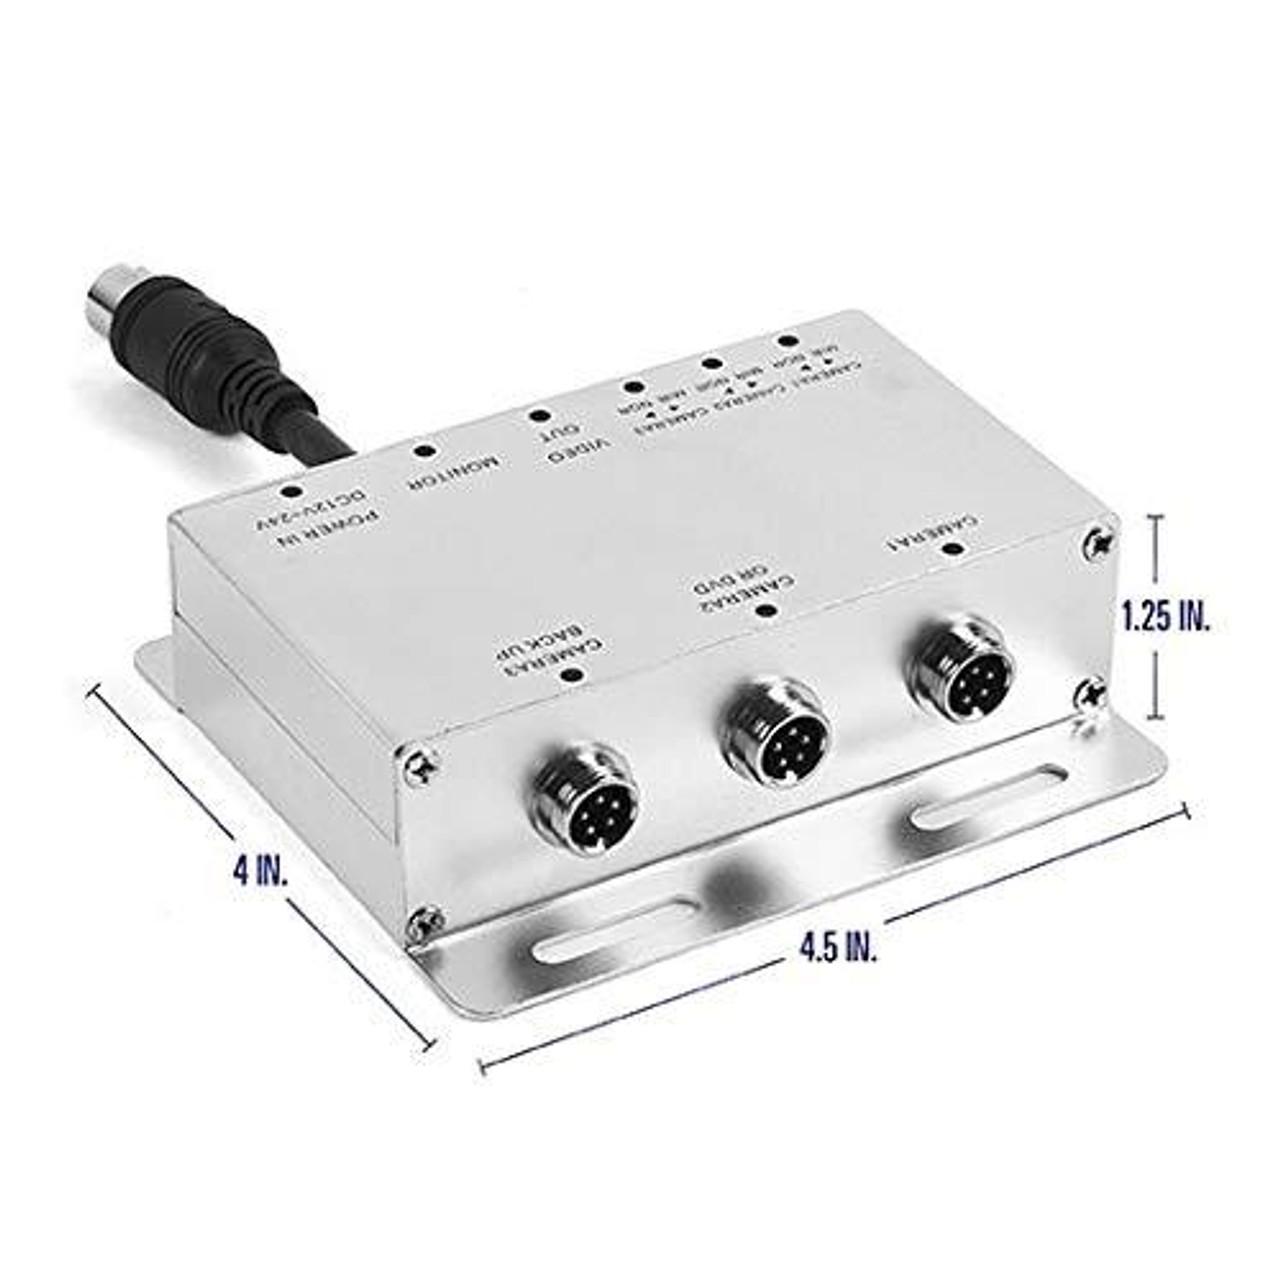 Multiplexer Control Box